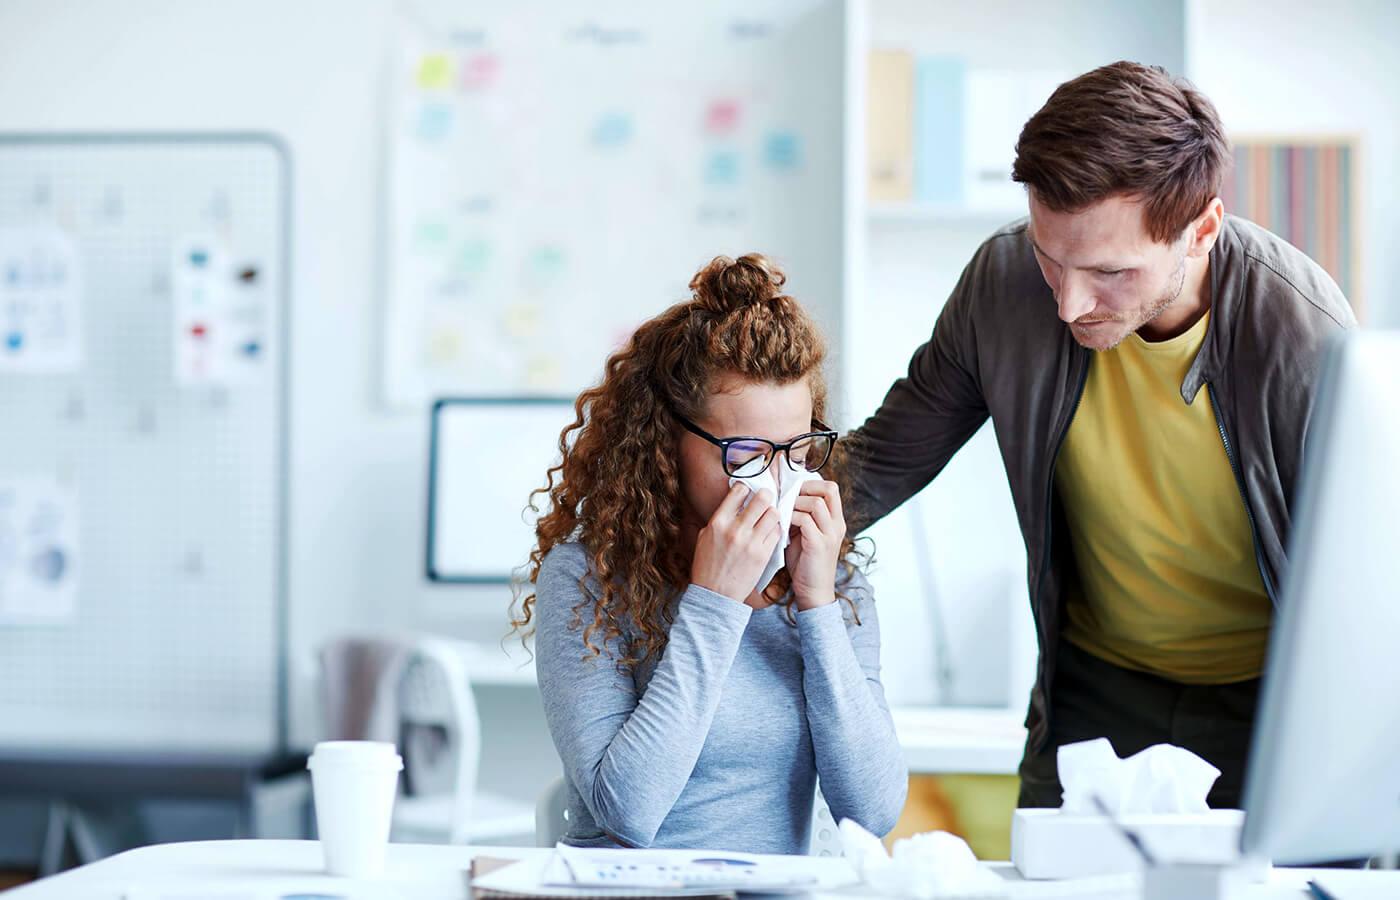 financial worries more help